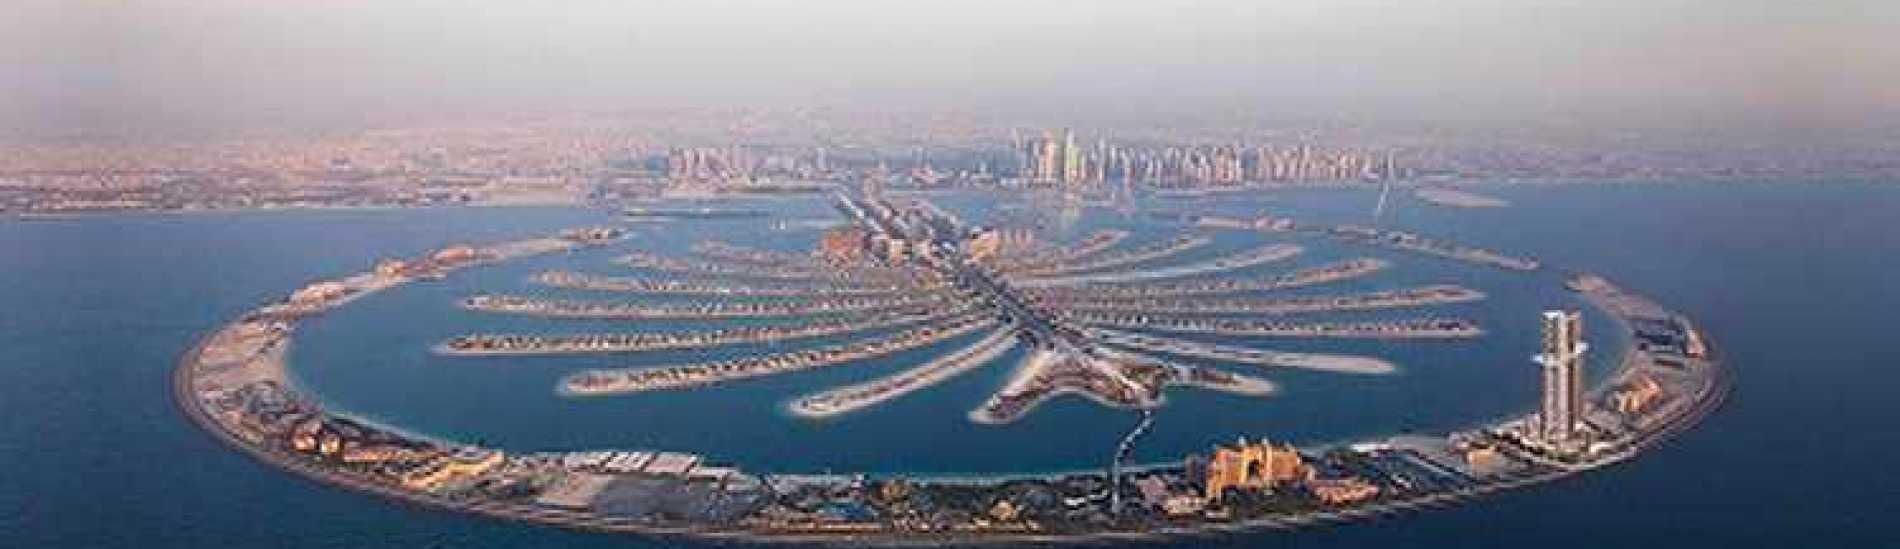 Thomson Reuters Zawya - Dubai's rising super rich set to boost luxury property sector